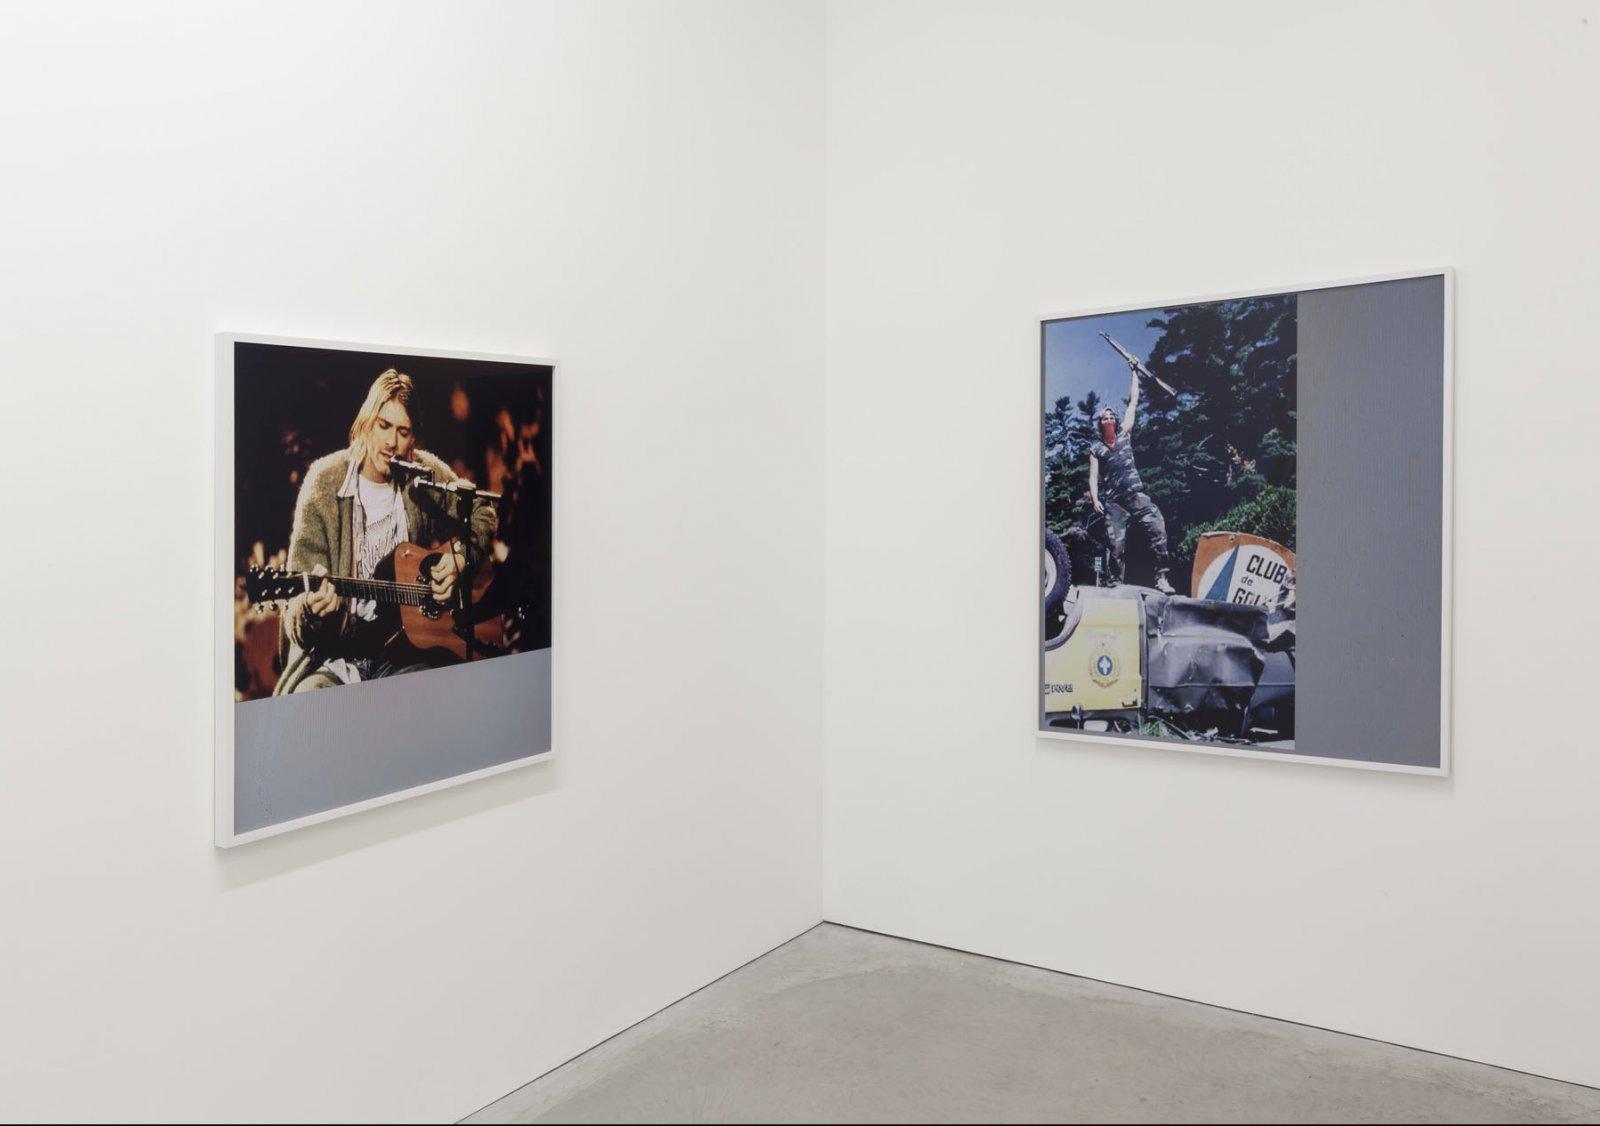 Duane Linklater, installation view,Learning, Susan Hobbs Gallery, Toronto, 2013. Photo: Toni Hafkenscheid.